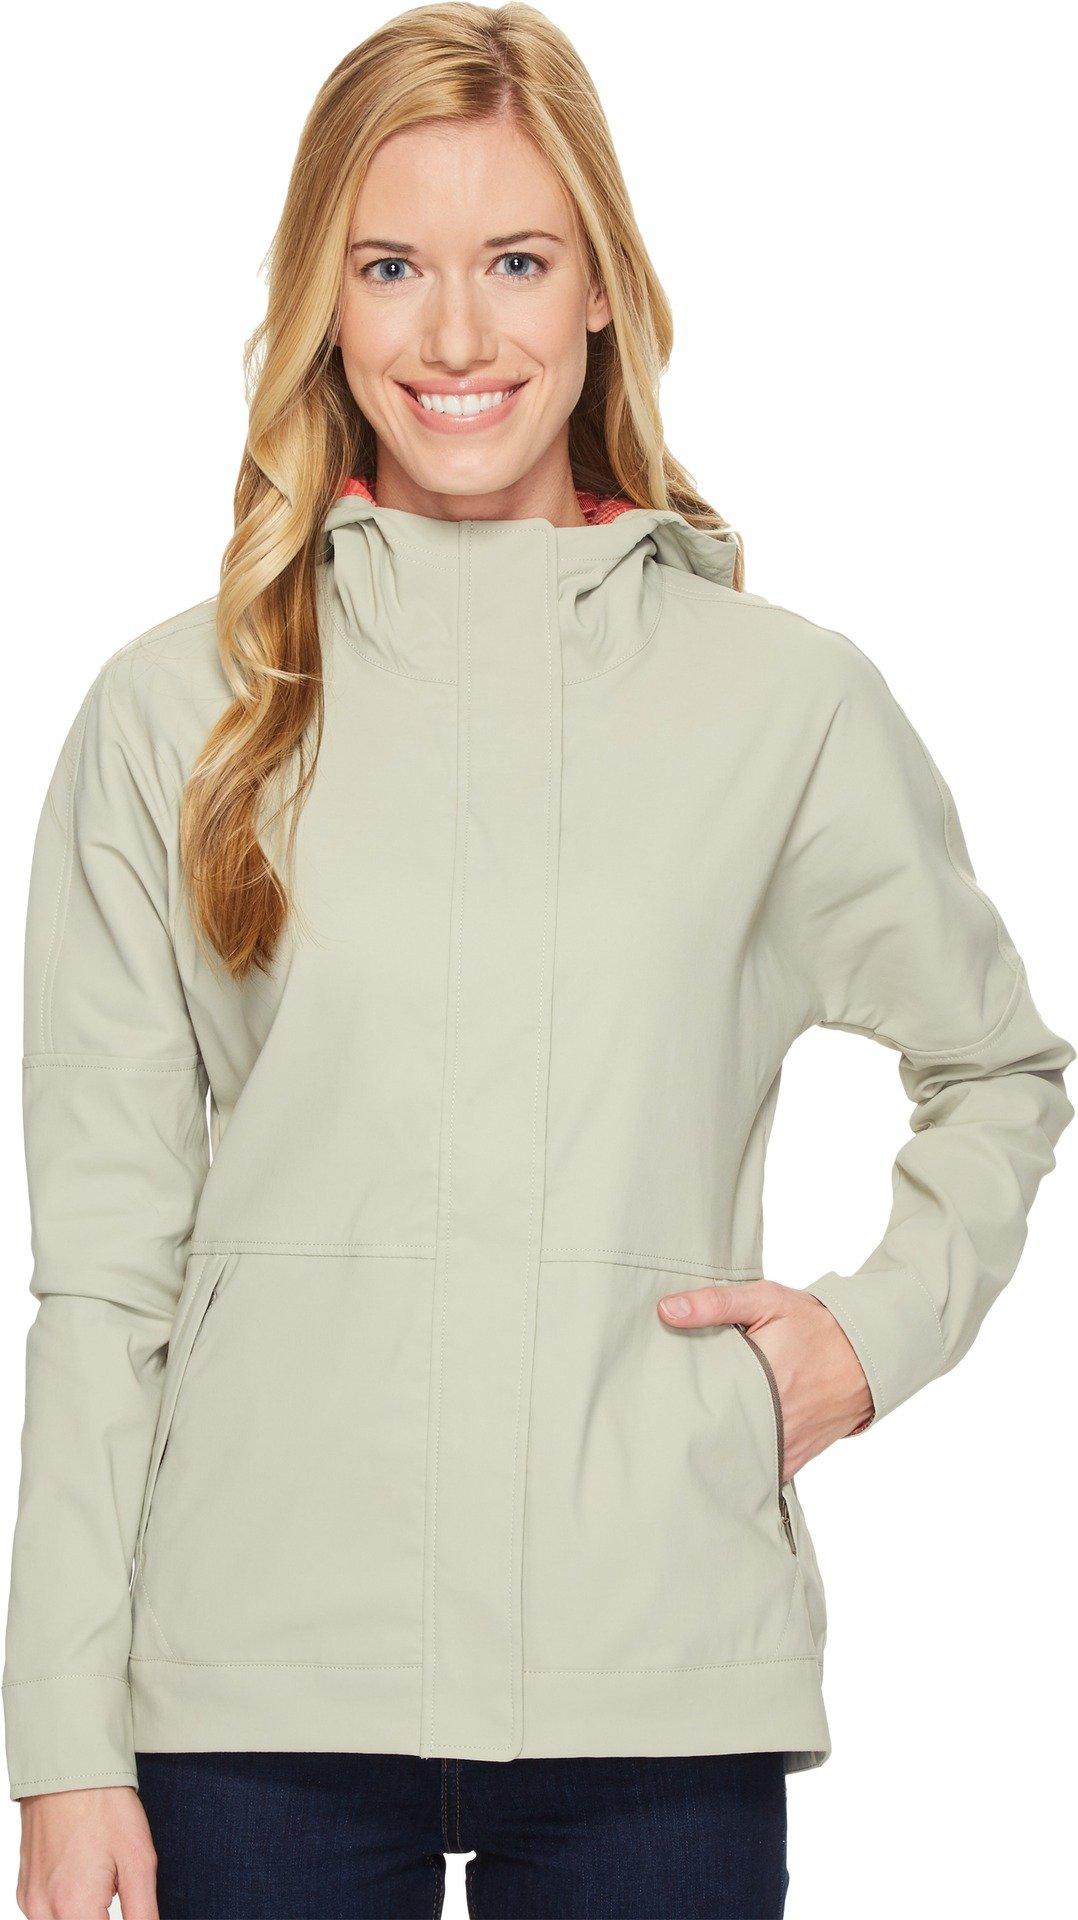 The North Face Women's Ultimate Travel Jacket Granite Bluff Tan (Prior Season) Medium